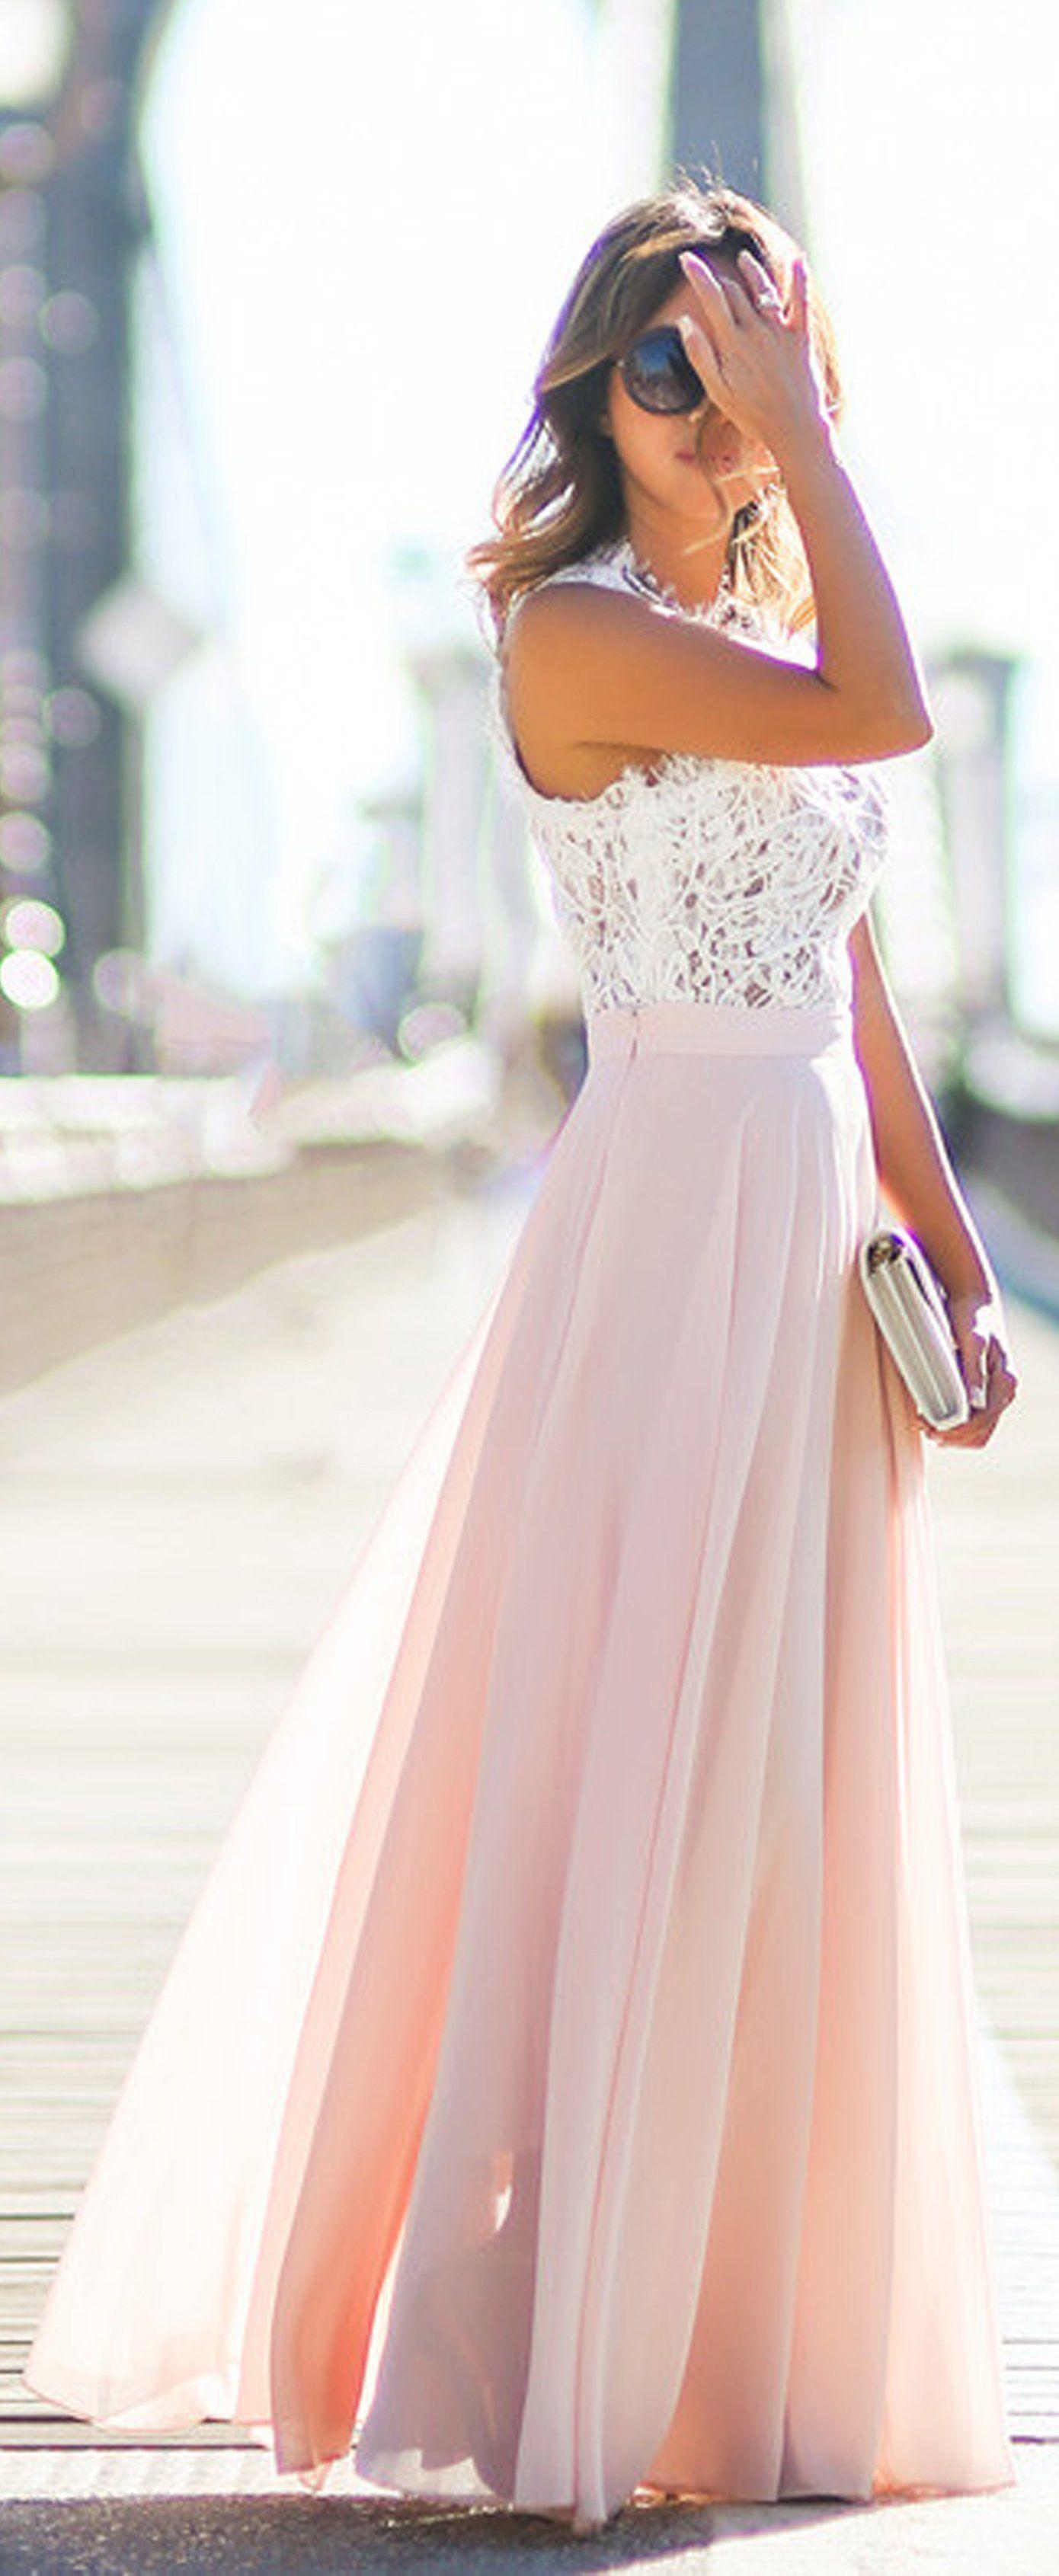 Ellisia white lace chiffon skirt long maxi dress vestido par